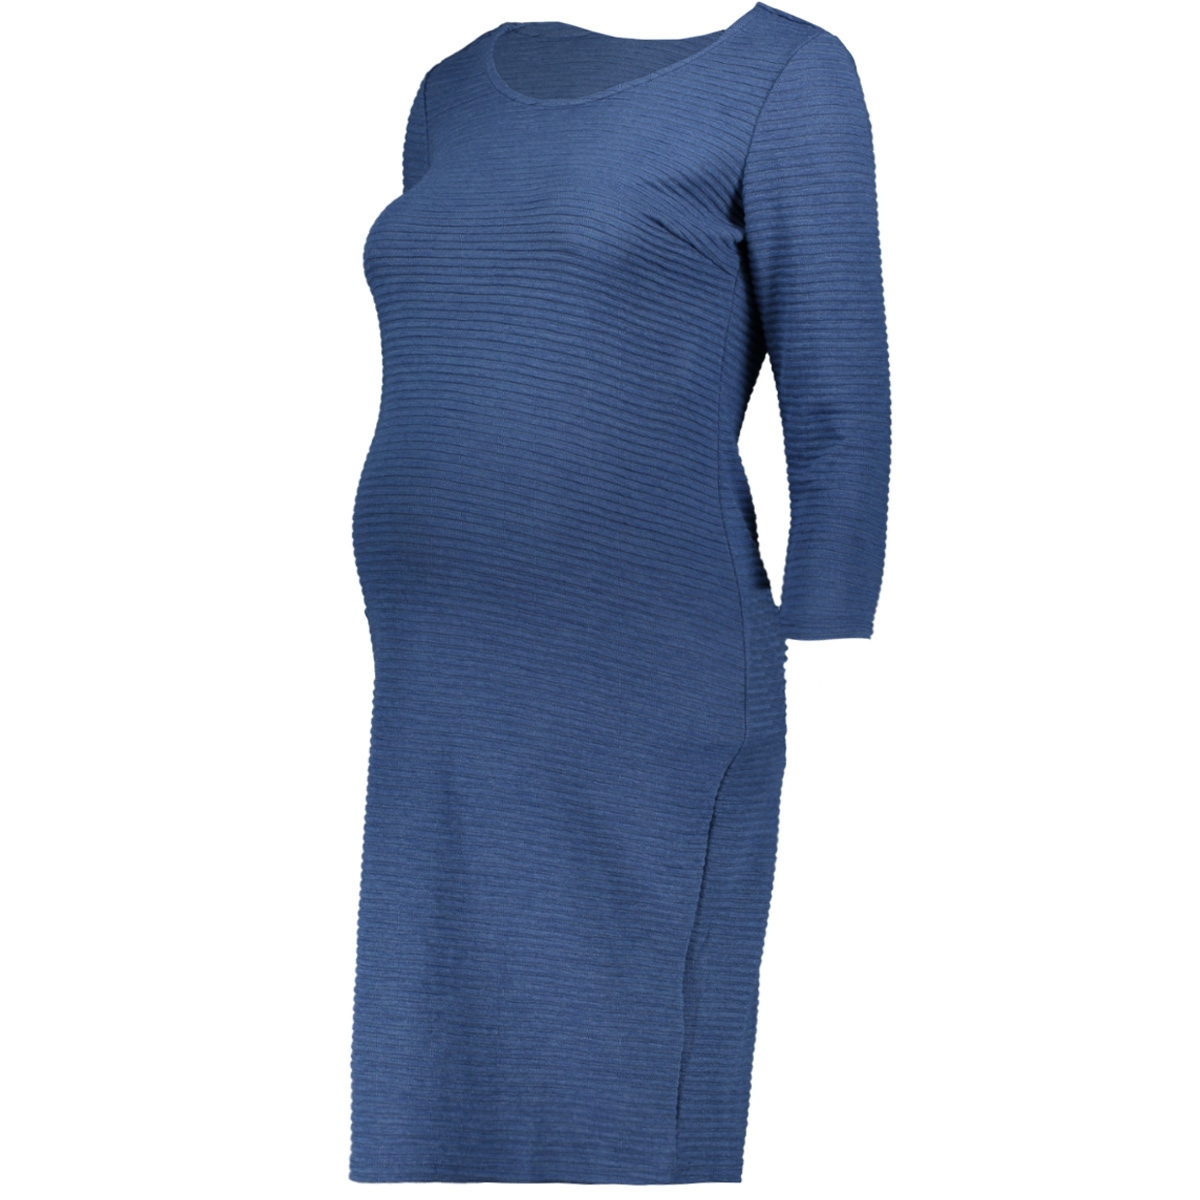 90139 dress 3/4 slv zinnia noppies positie jurk dark denim